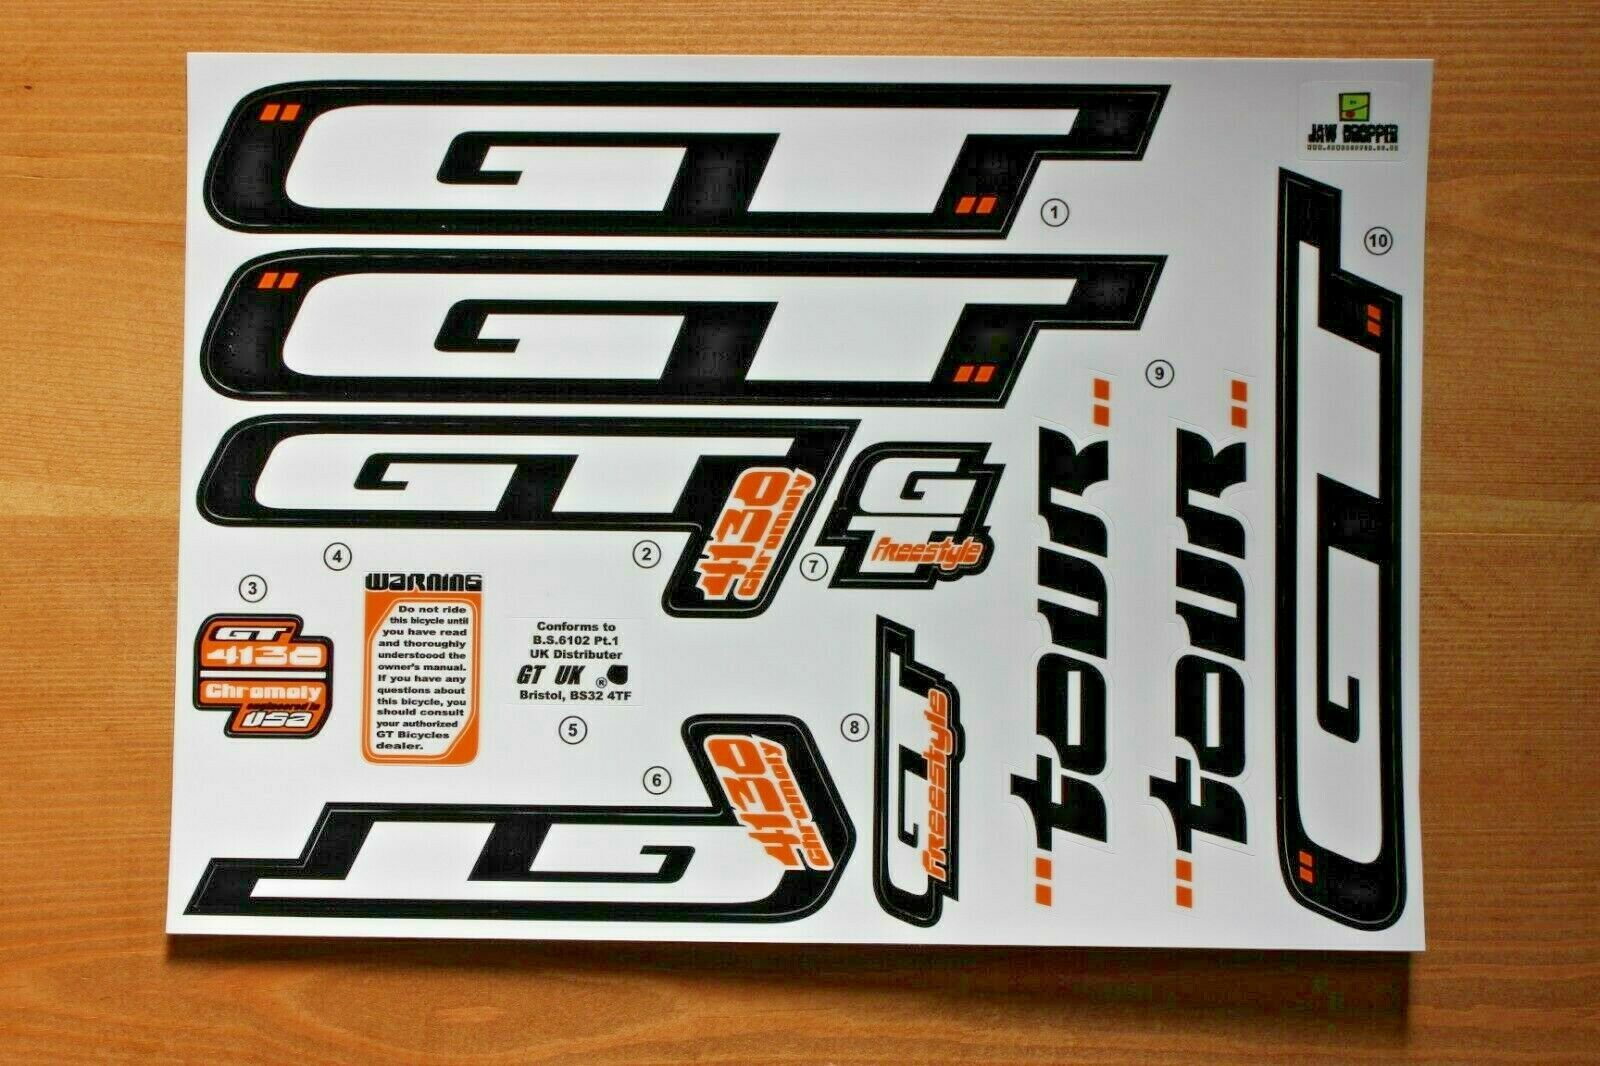 2000 Reproduction GT Tour BMX Decalcomania Setper telaio rosso dipinta